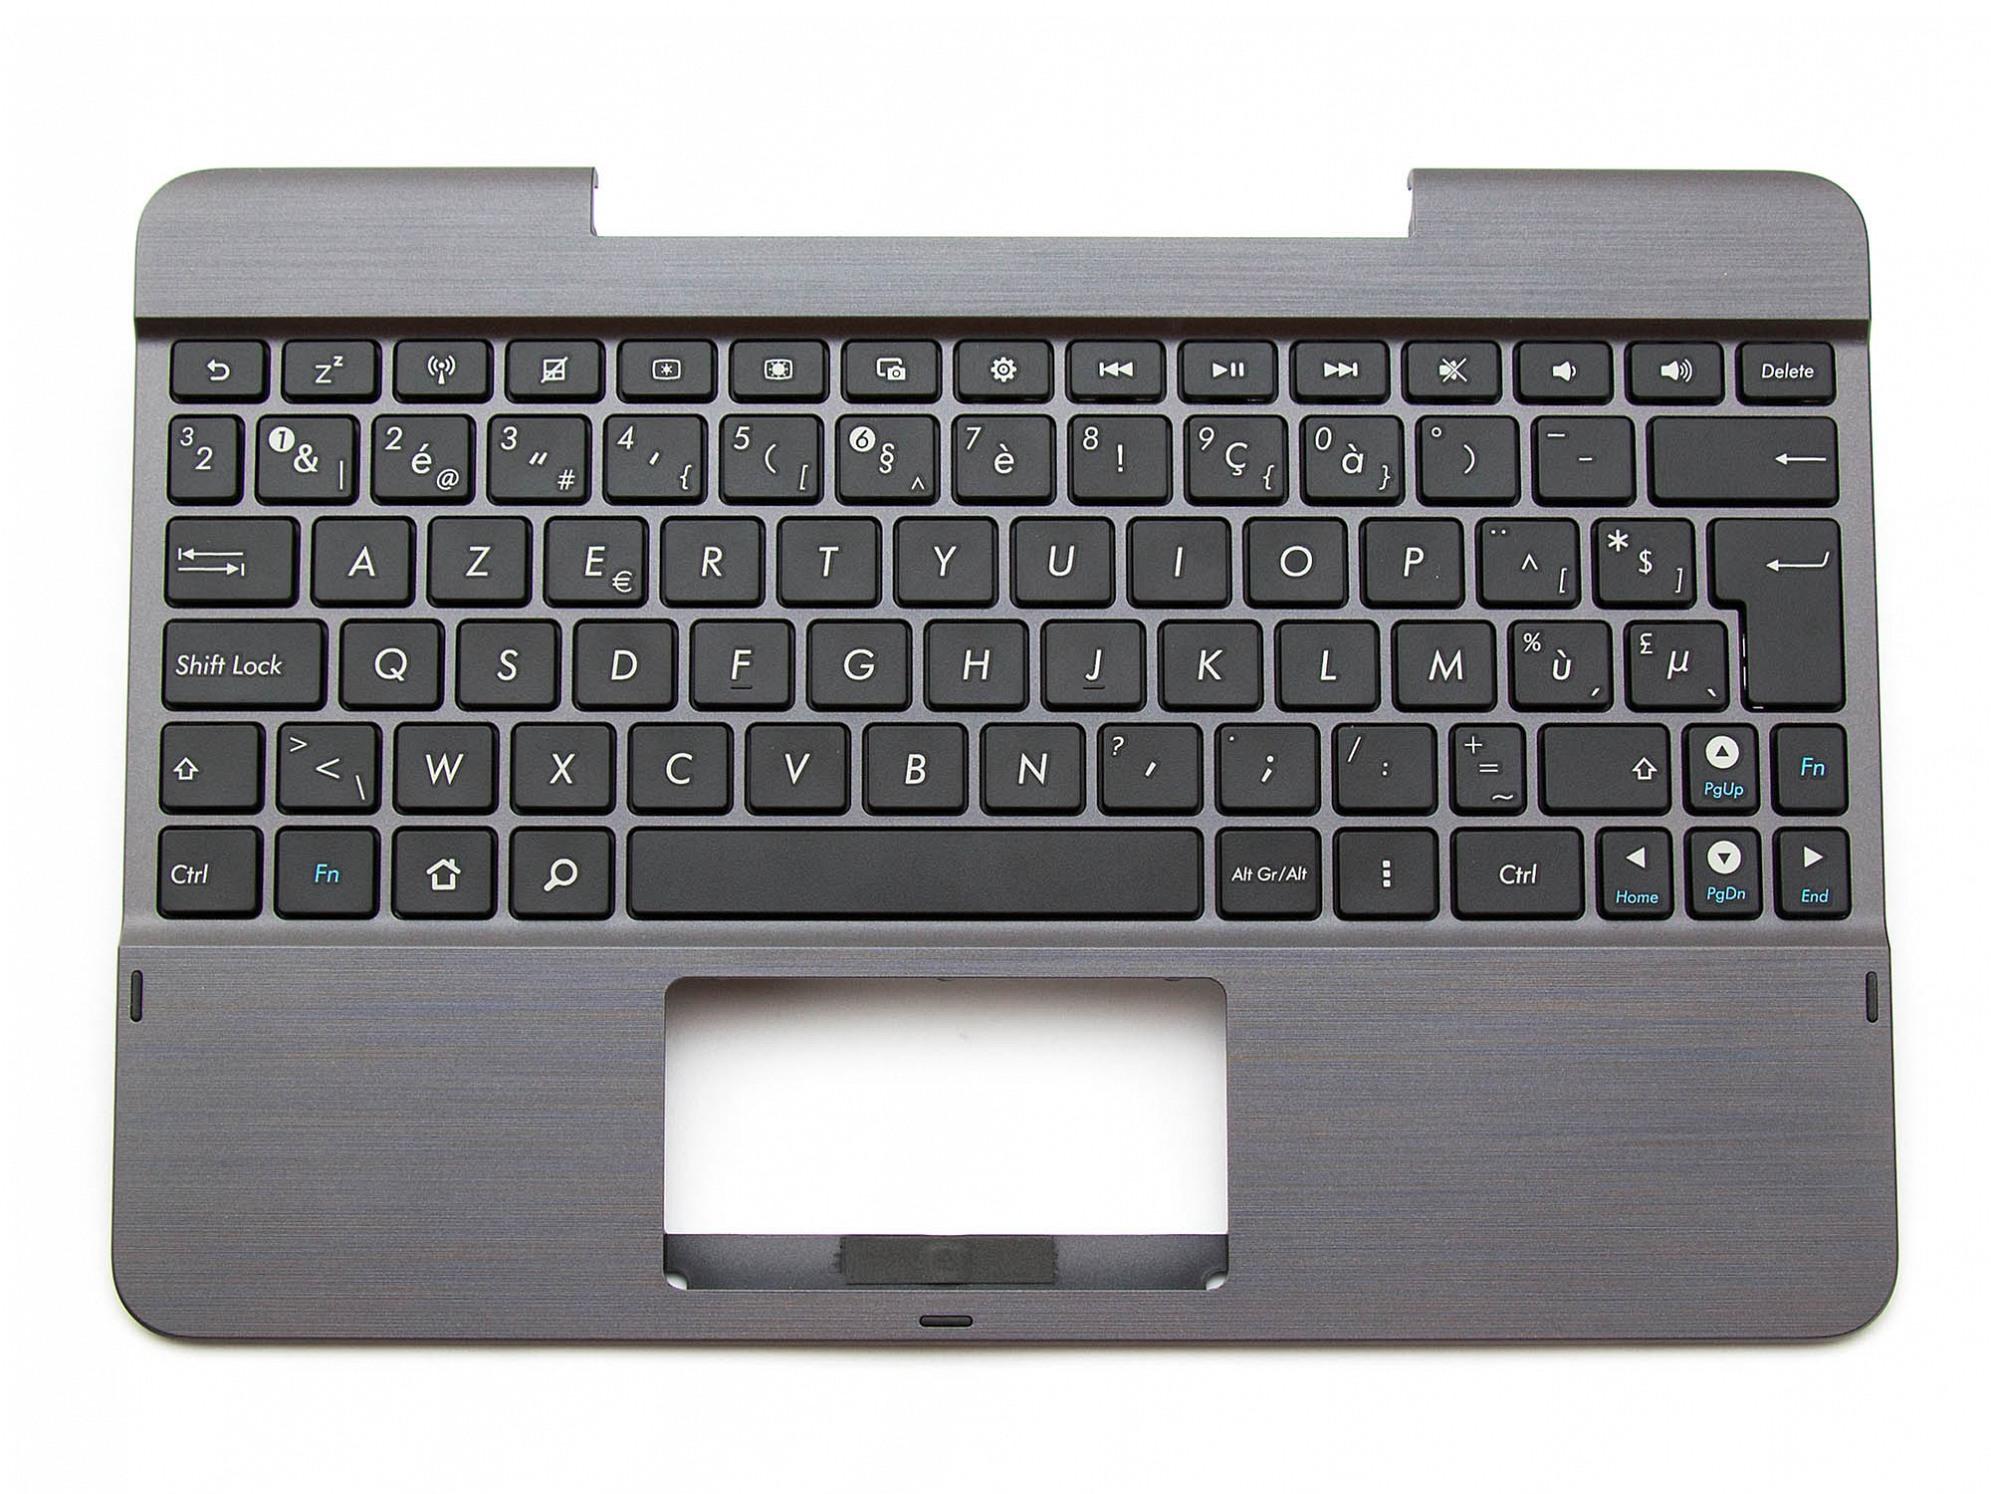 TF103C Tastatur inkl. Topcase BE (belgisch) schwarz/grau Original